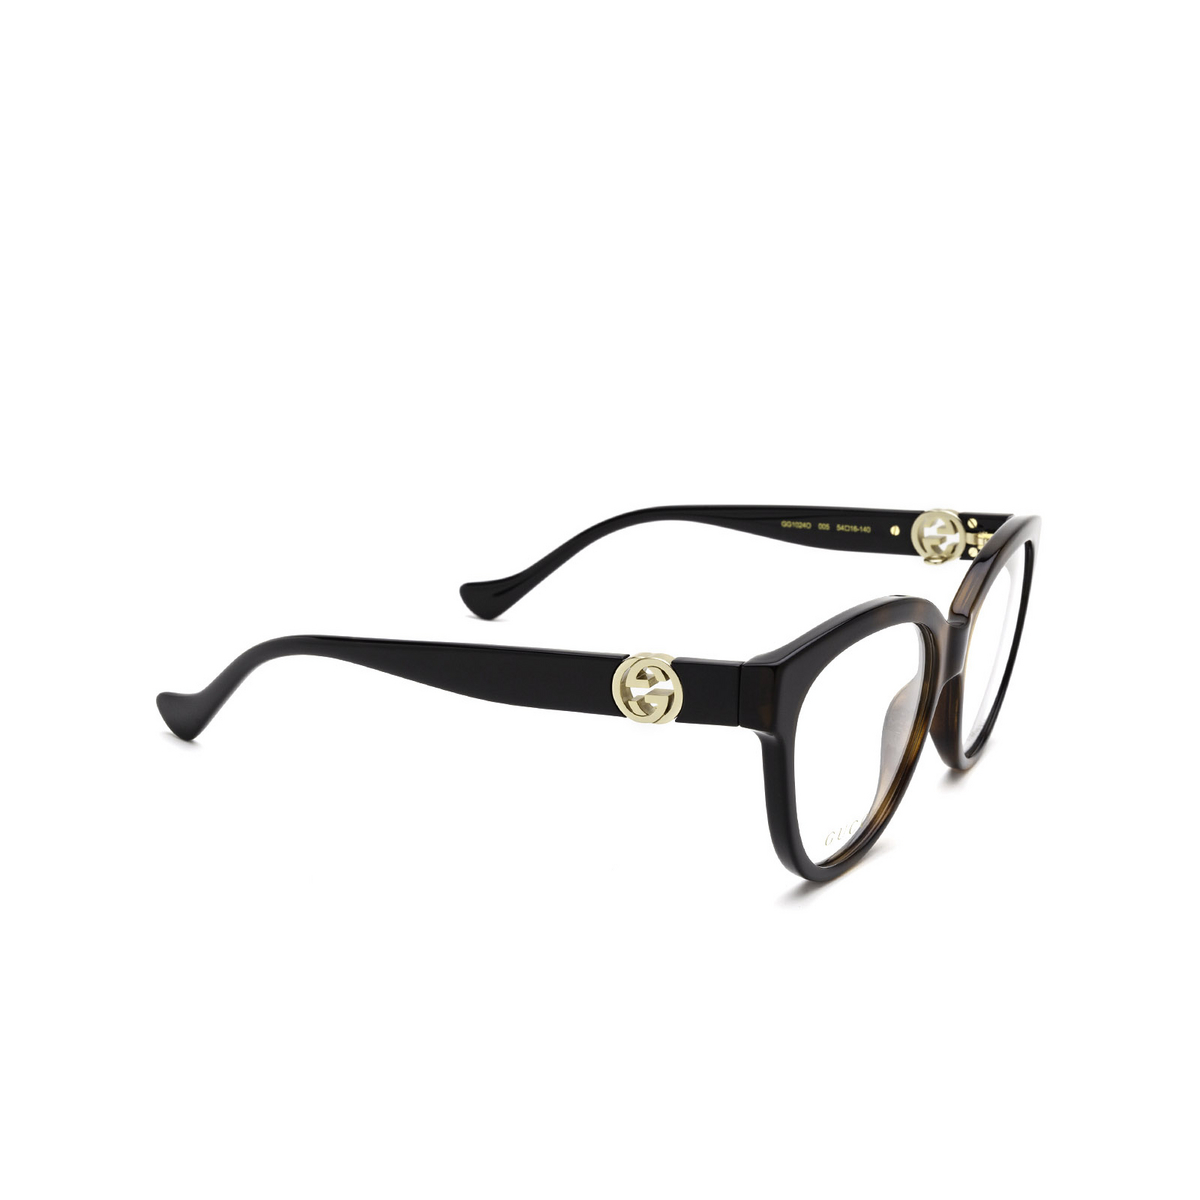 Gucci® Oval Eyeglasses: GG1024O color Black & Havana 005 - three-quarters view.